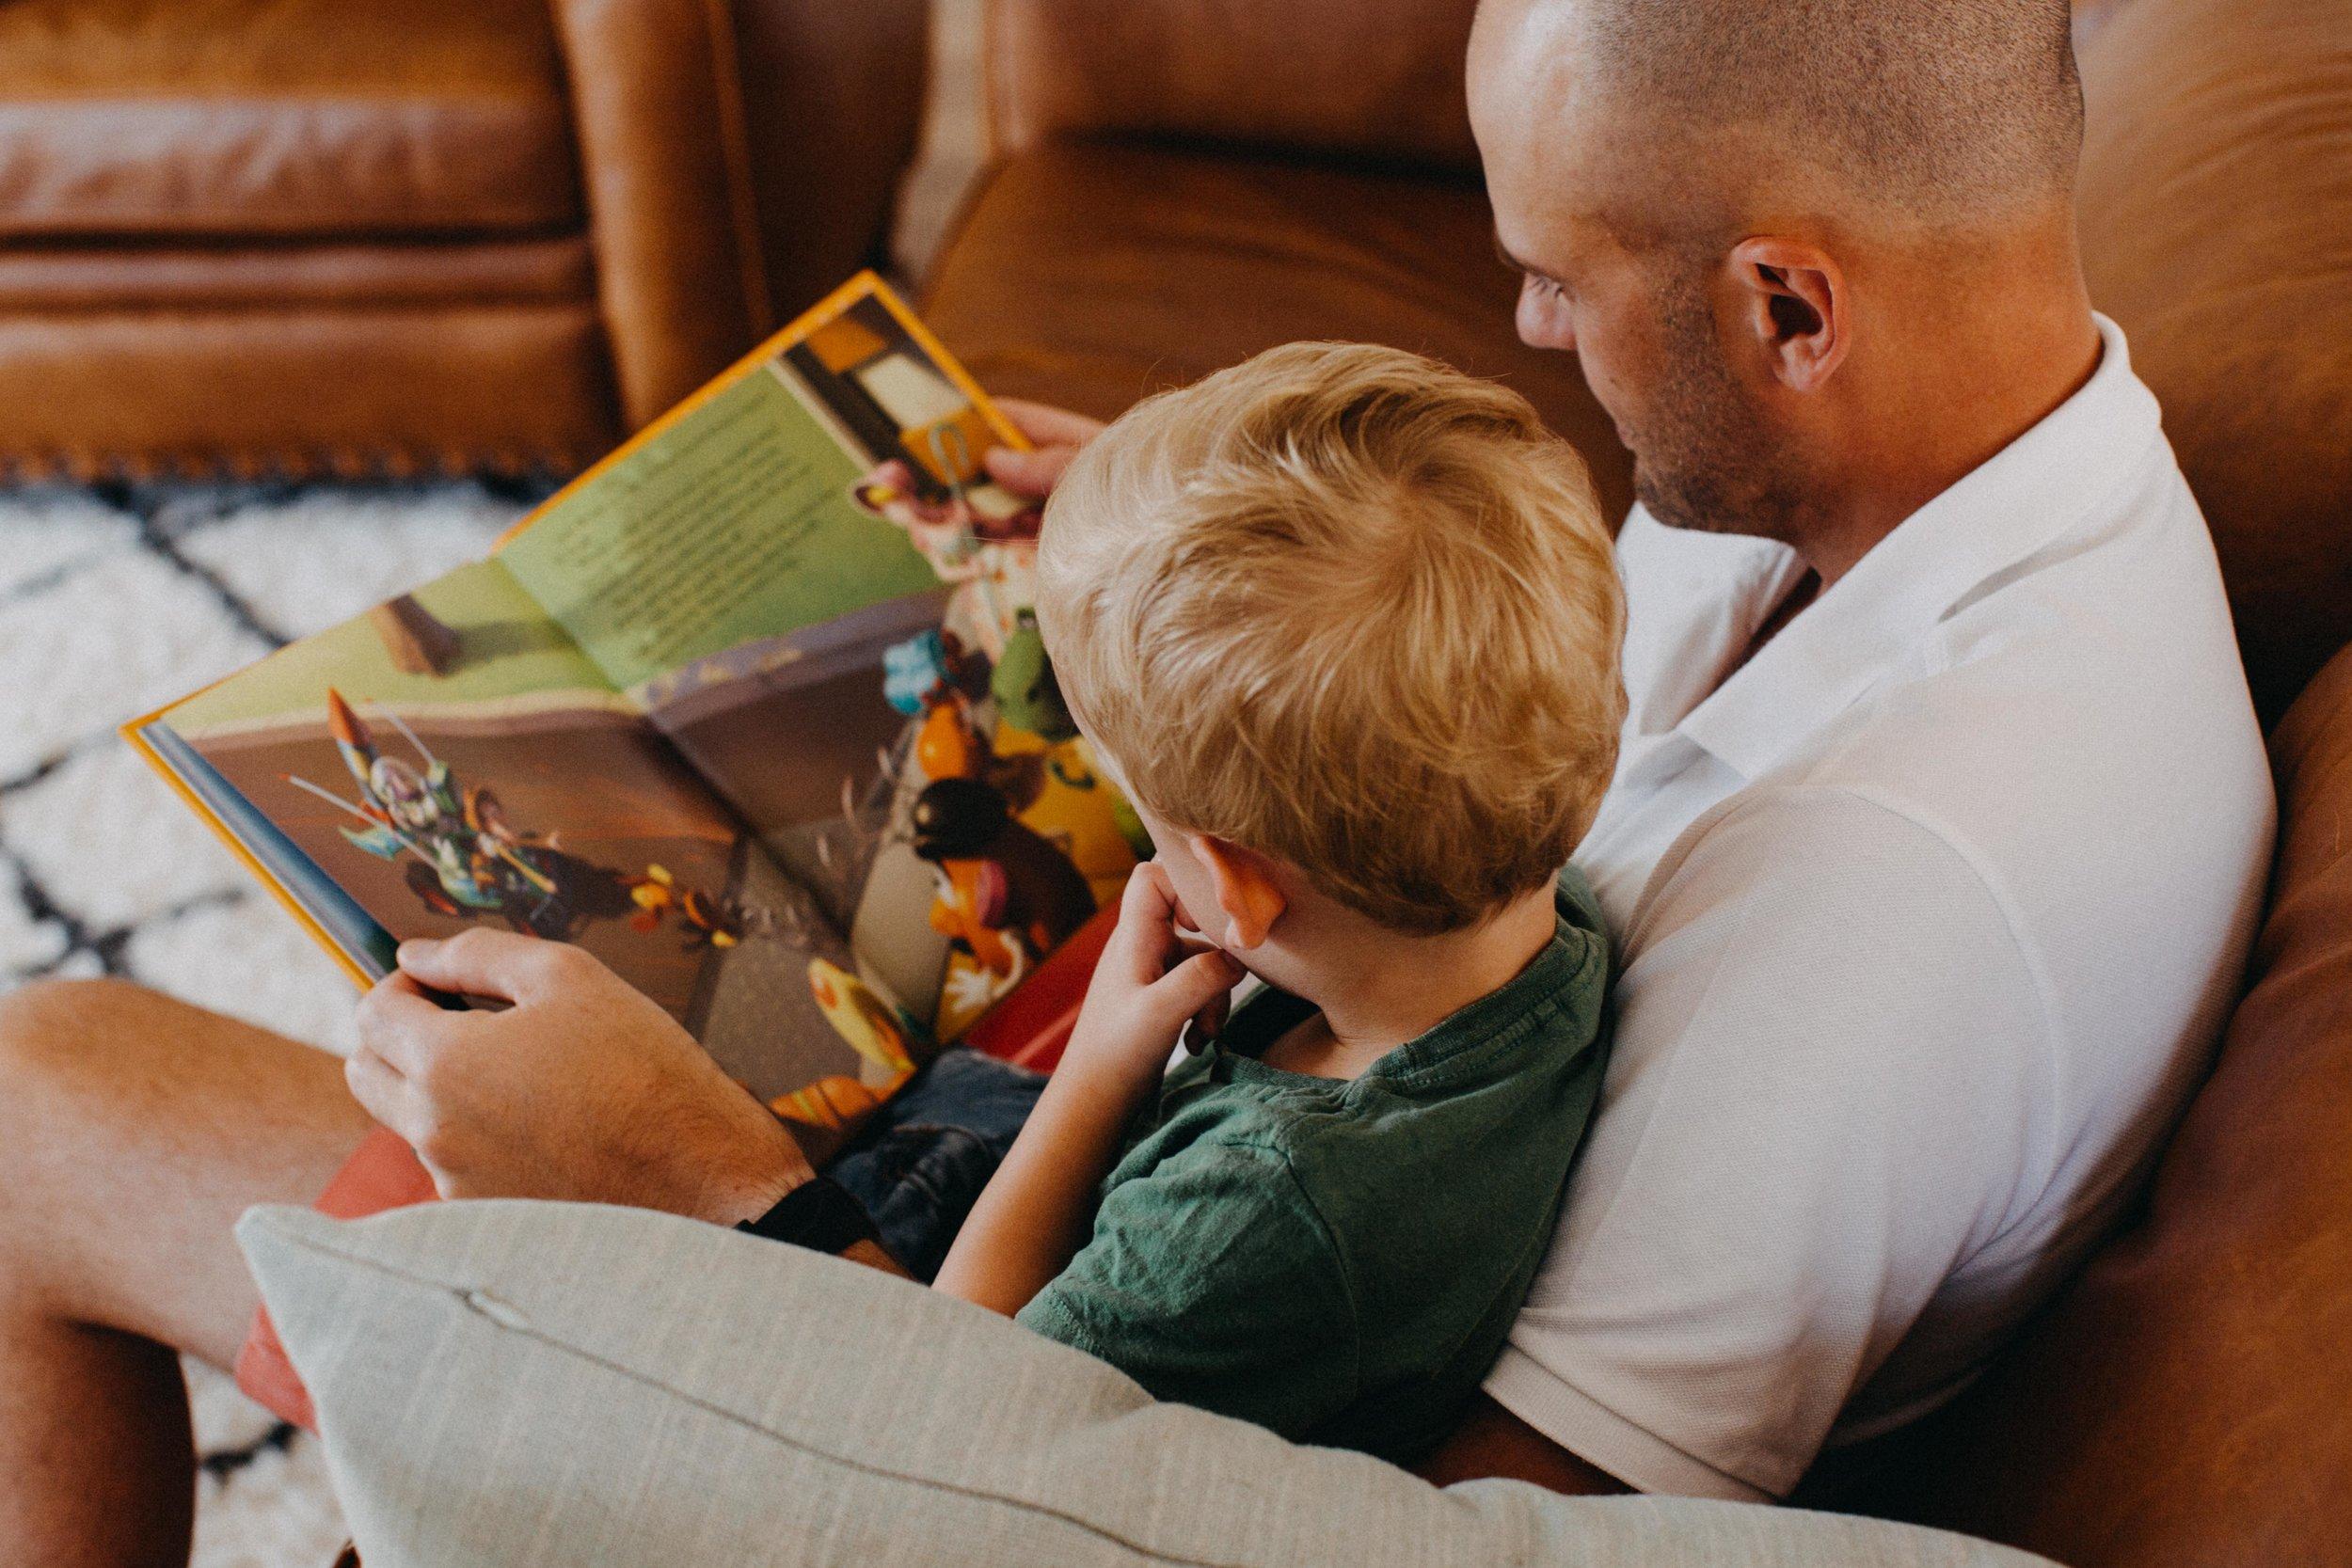 family-photography-picton-lifestyle-www.emilyobrienphotography.net-12.jpg